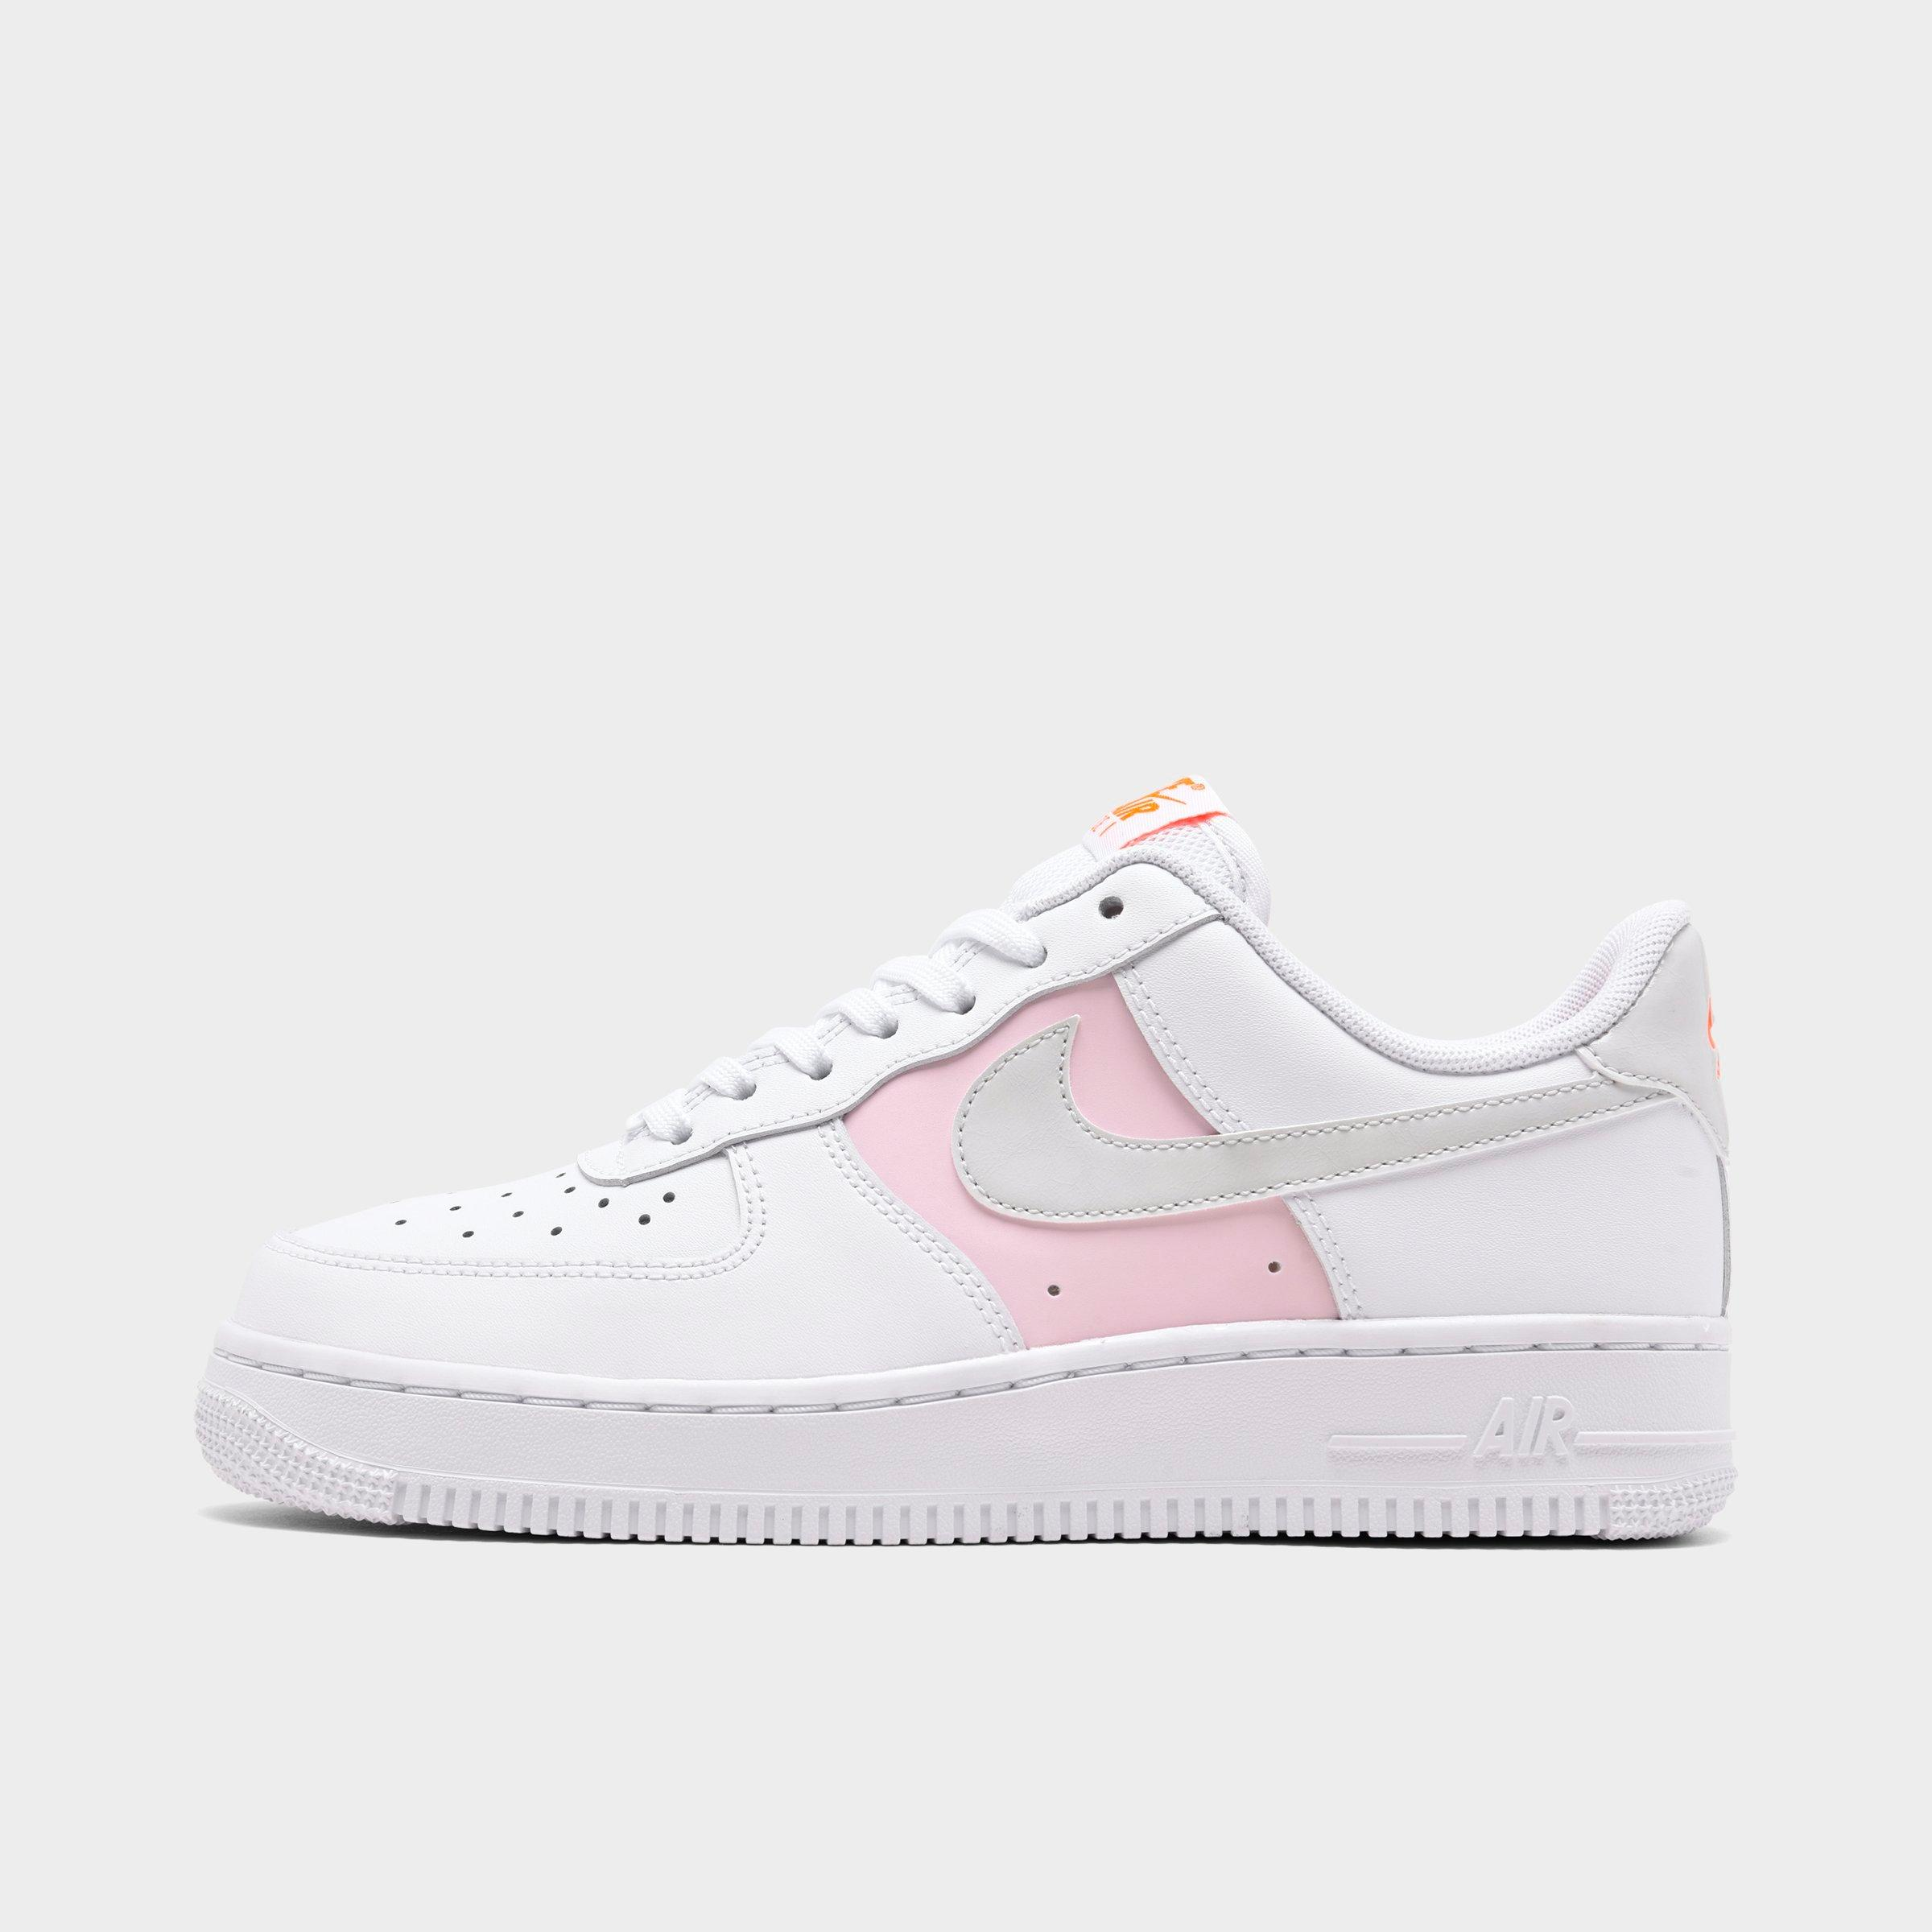 nike womens shoes finish line